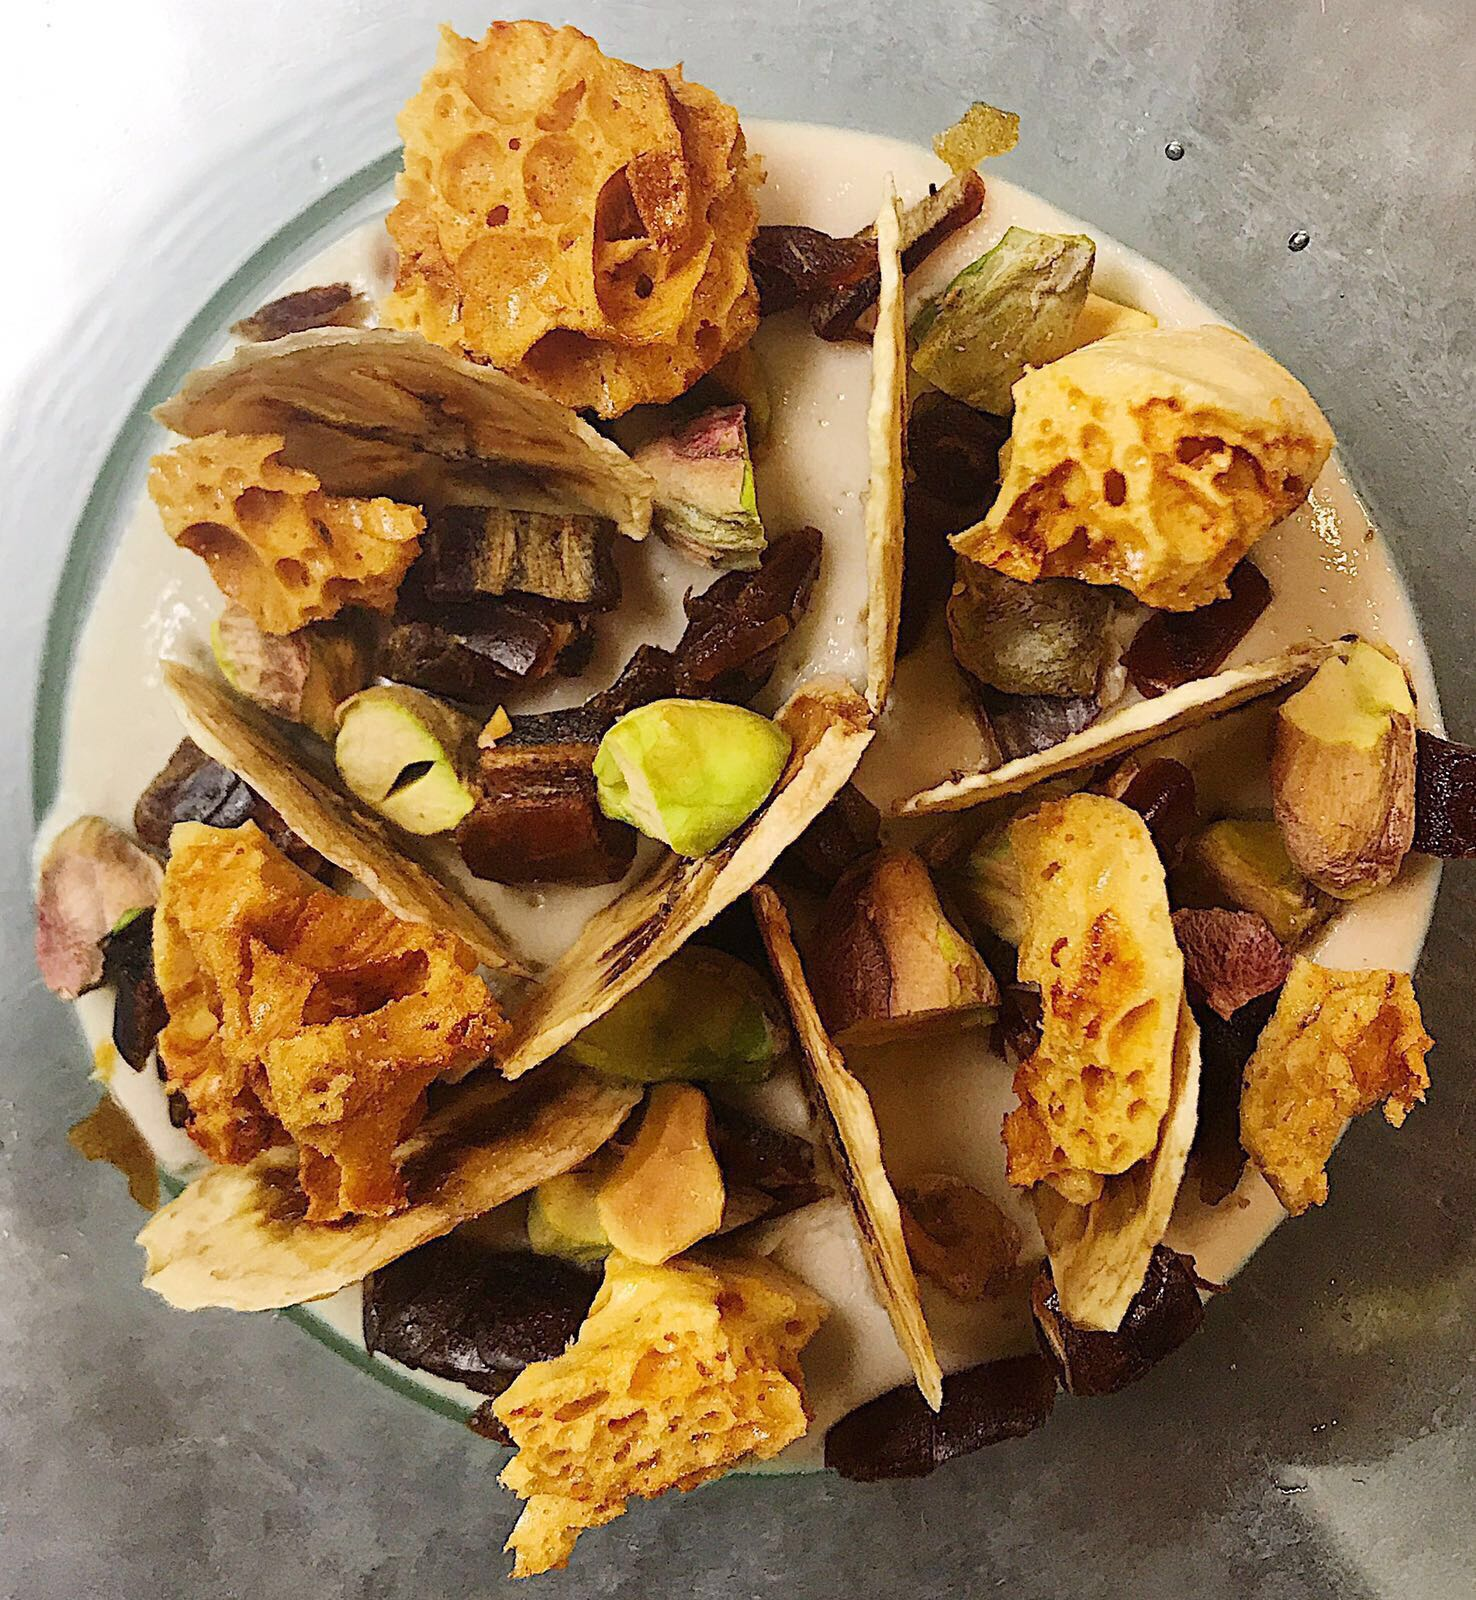 Banana custard with dates, honeycomb and pistachios   Tom De Keyser, head chef, The Coach